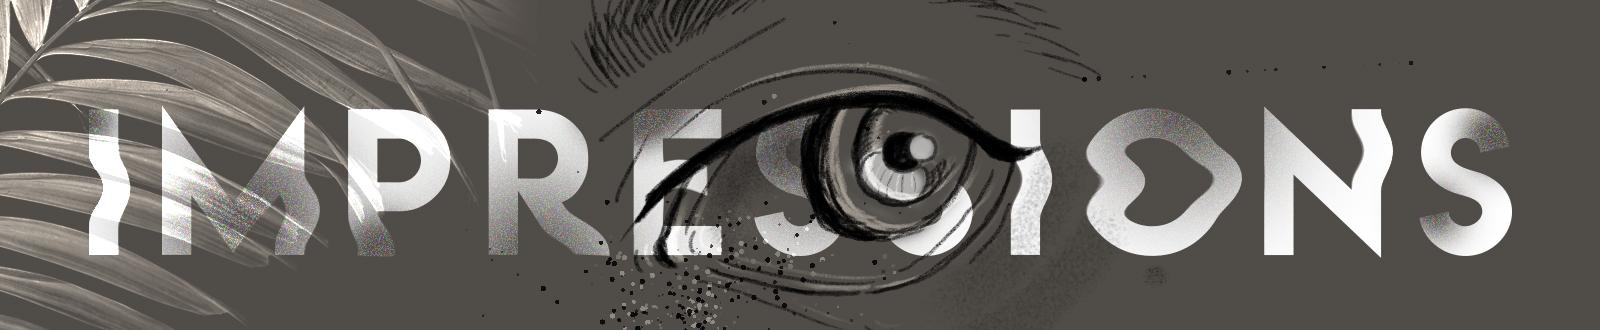 cynlagos-graphicdesign-impressions.jpg